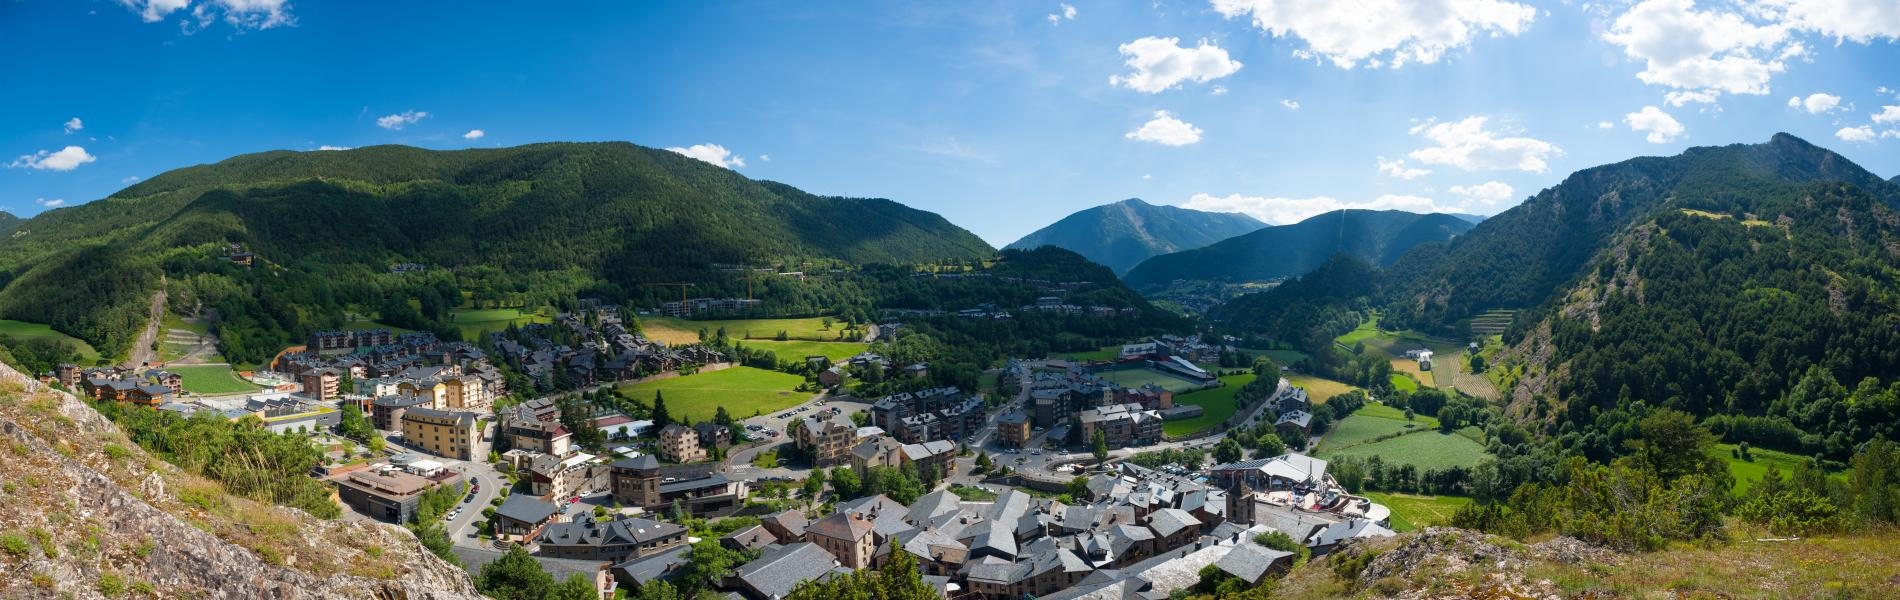 Andorra Adventure Tourism Field School